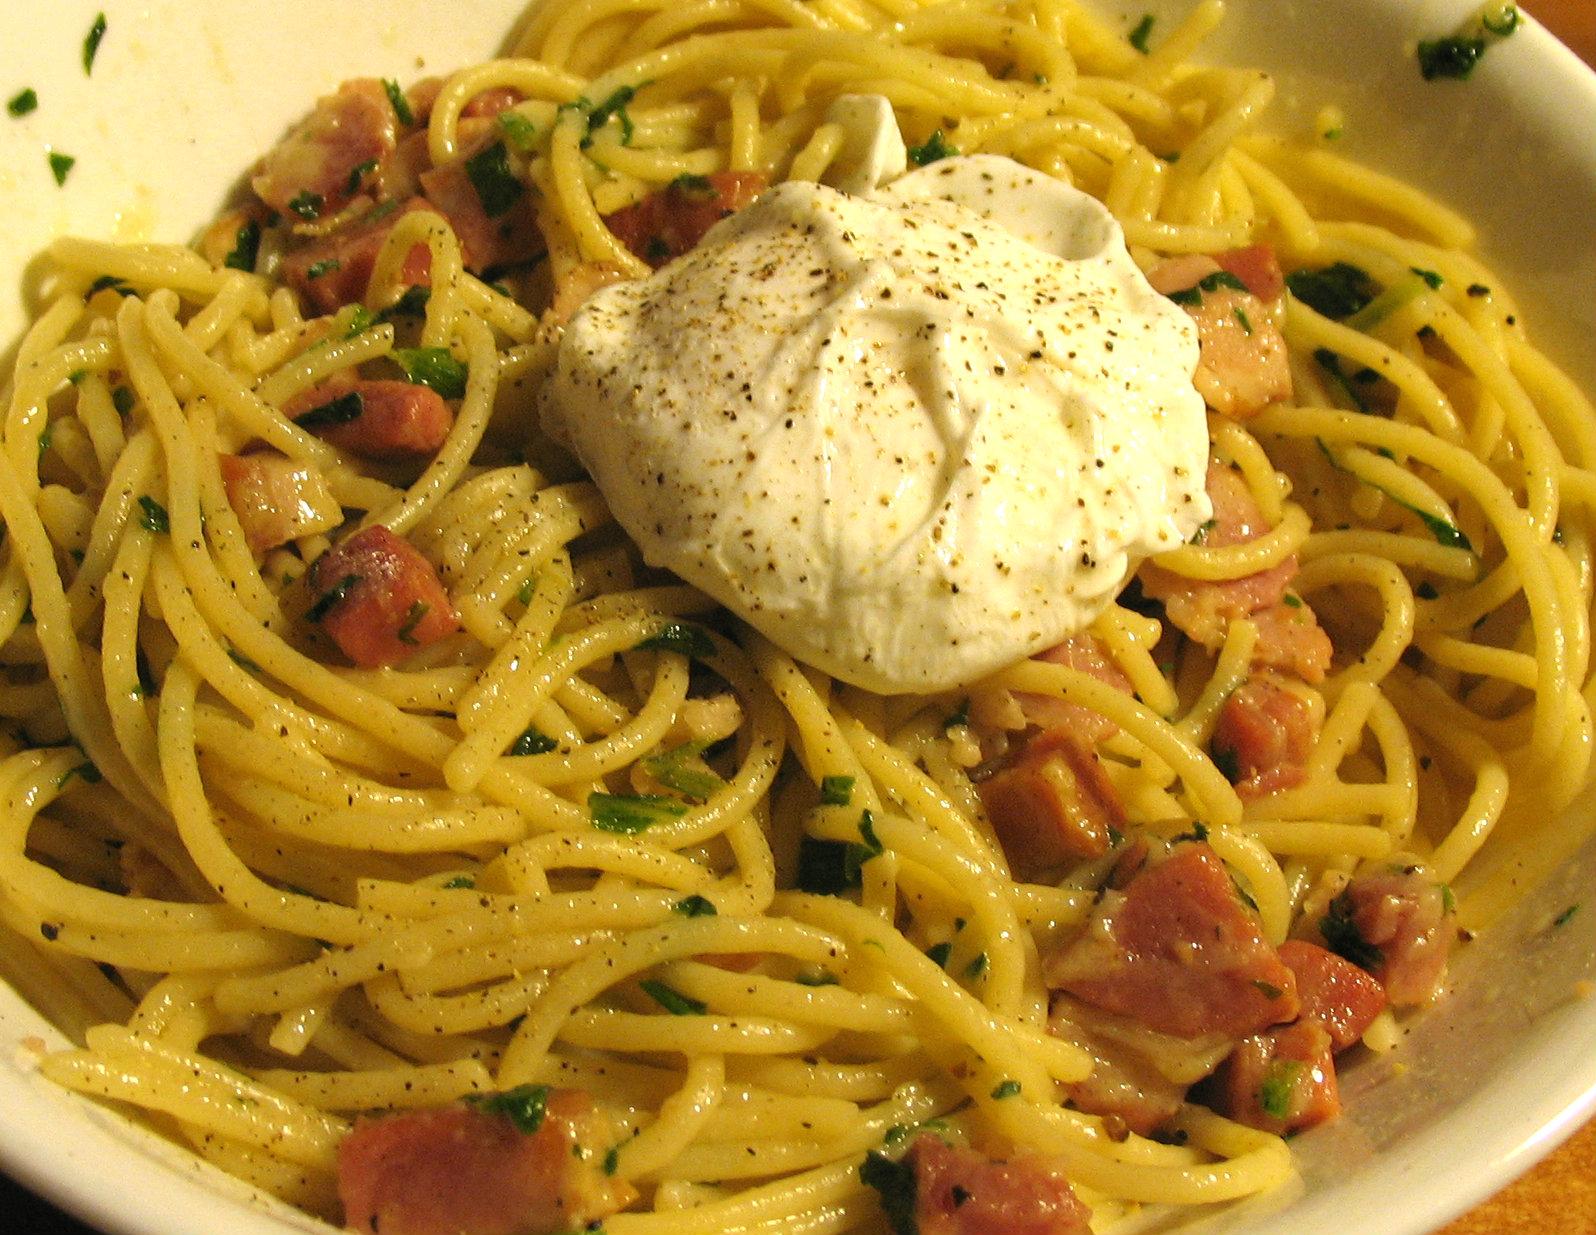 Reputable Baked Ziti Chuck Roast Michael Symon S Recipe I Made Michael Spaghetti Was I Made Michael Spaghetti Was Delicious Michael Symon S Recipe nice food Michael Symon Recipes